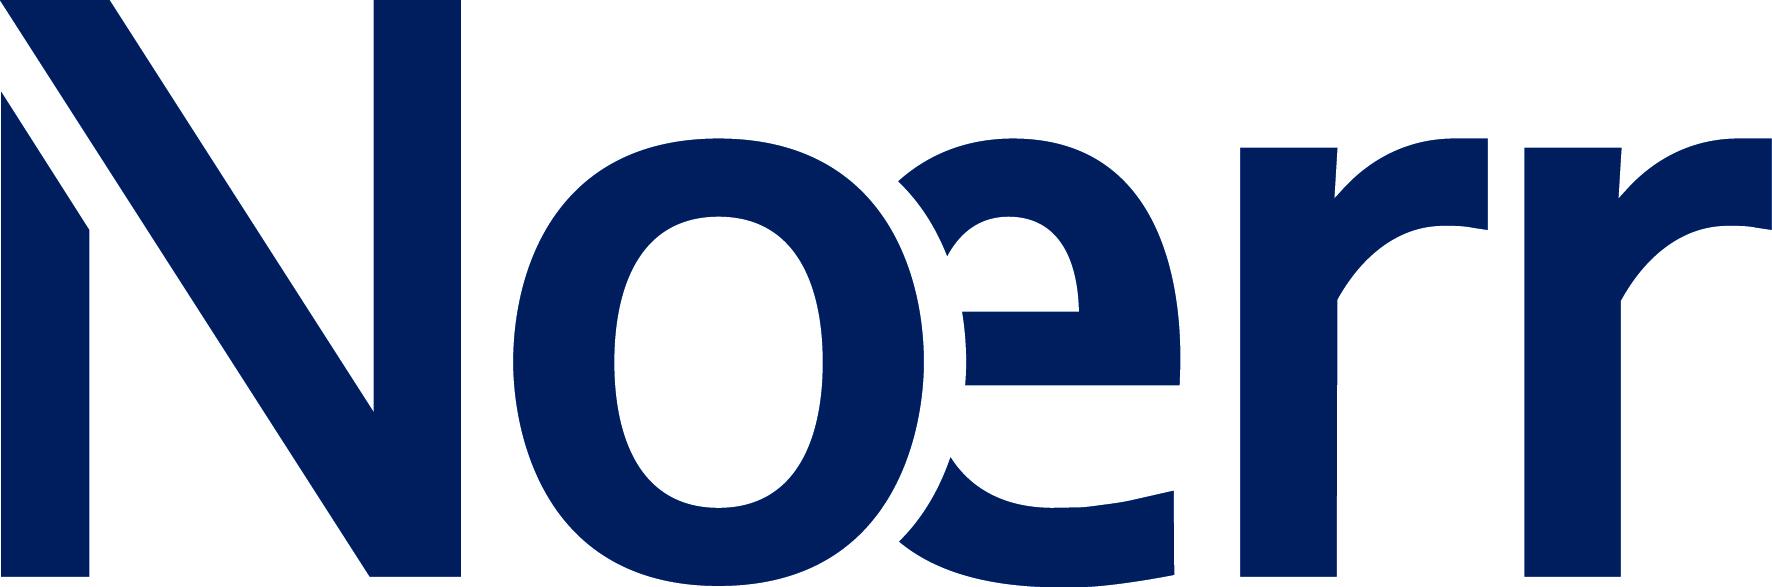 Noerr Biedecki, logo